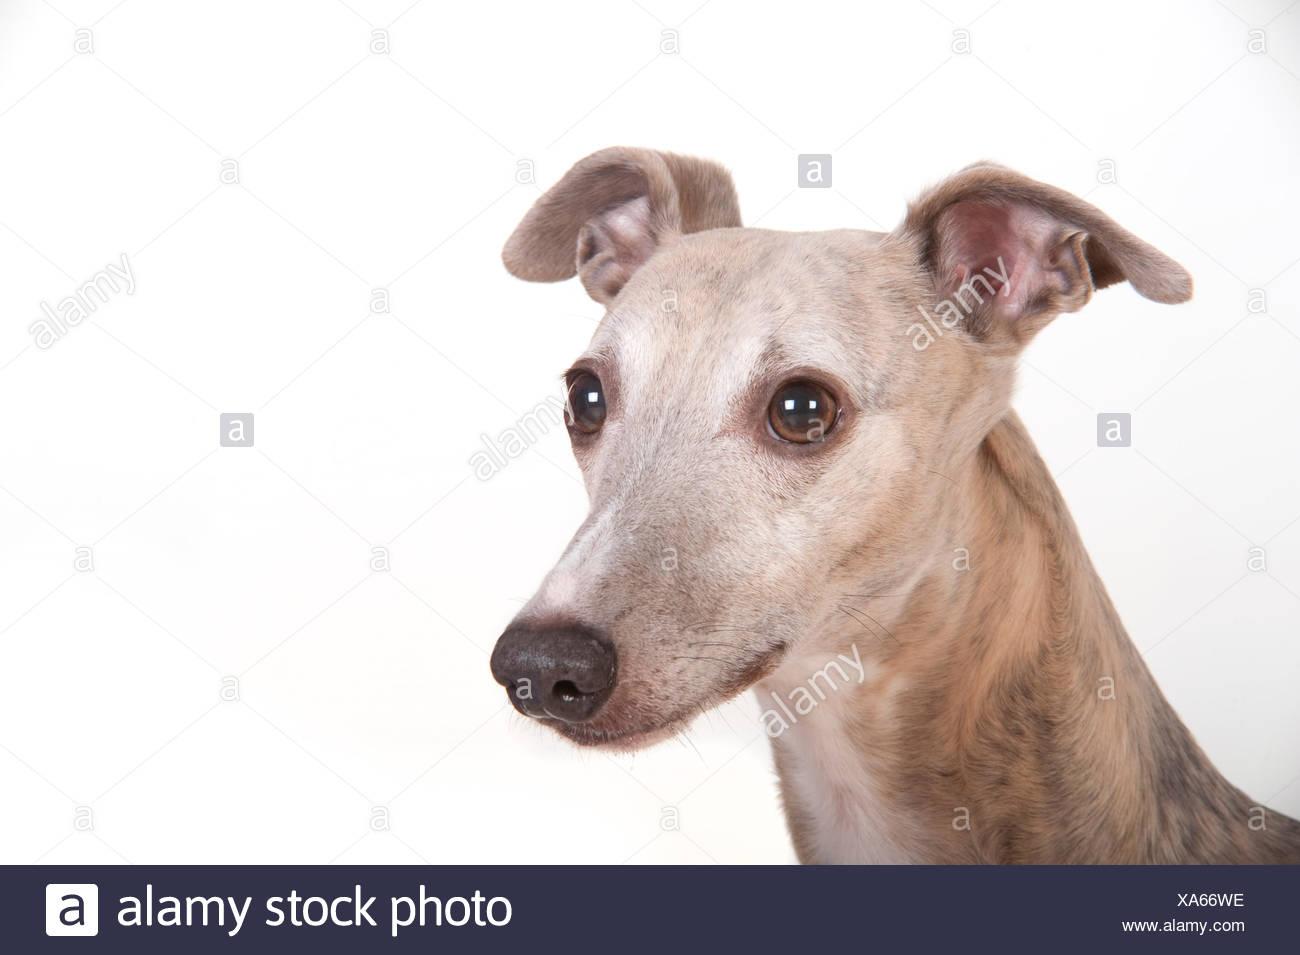 adfe957114abb Whippet Dog Head Stock Photos   Whippet Dog Head Stock Images - Alamy